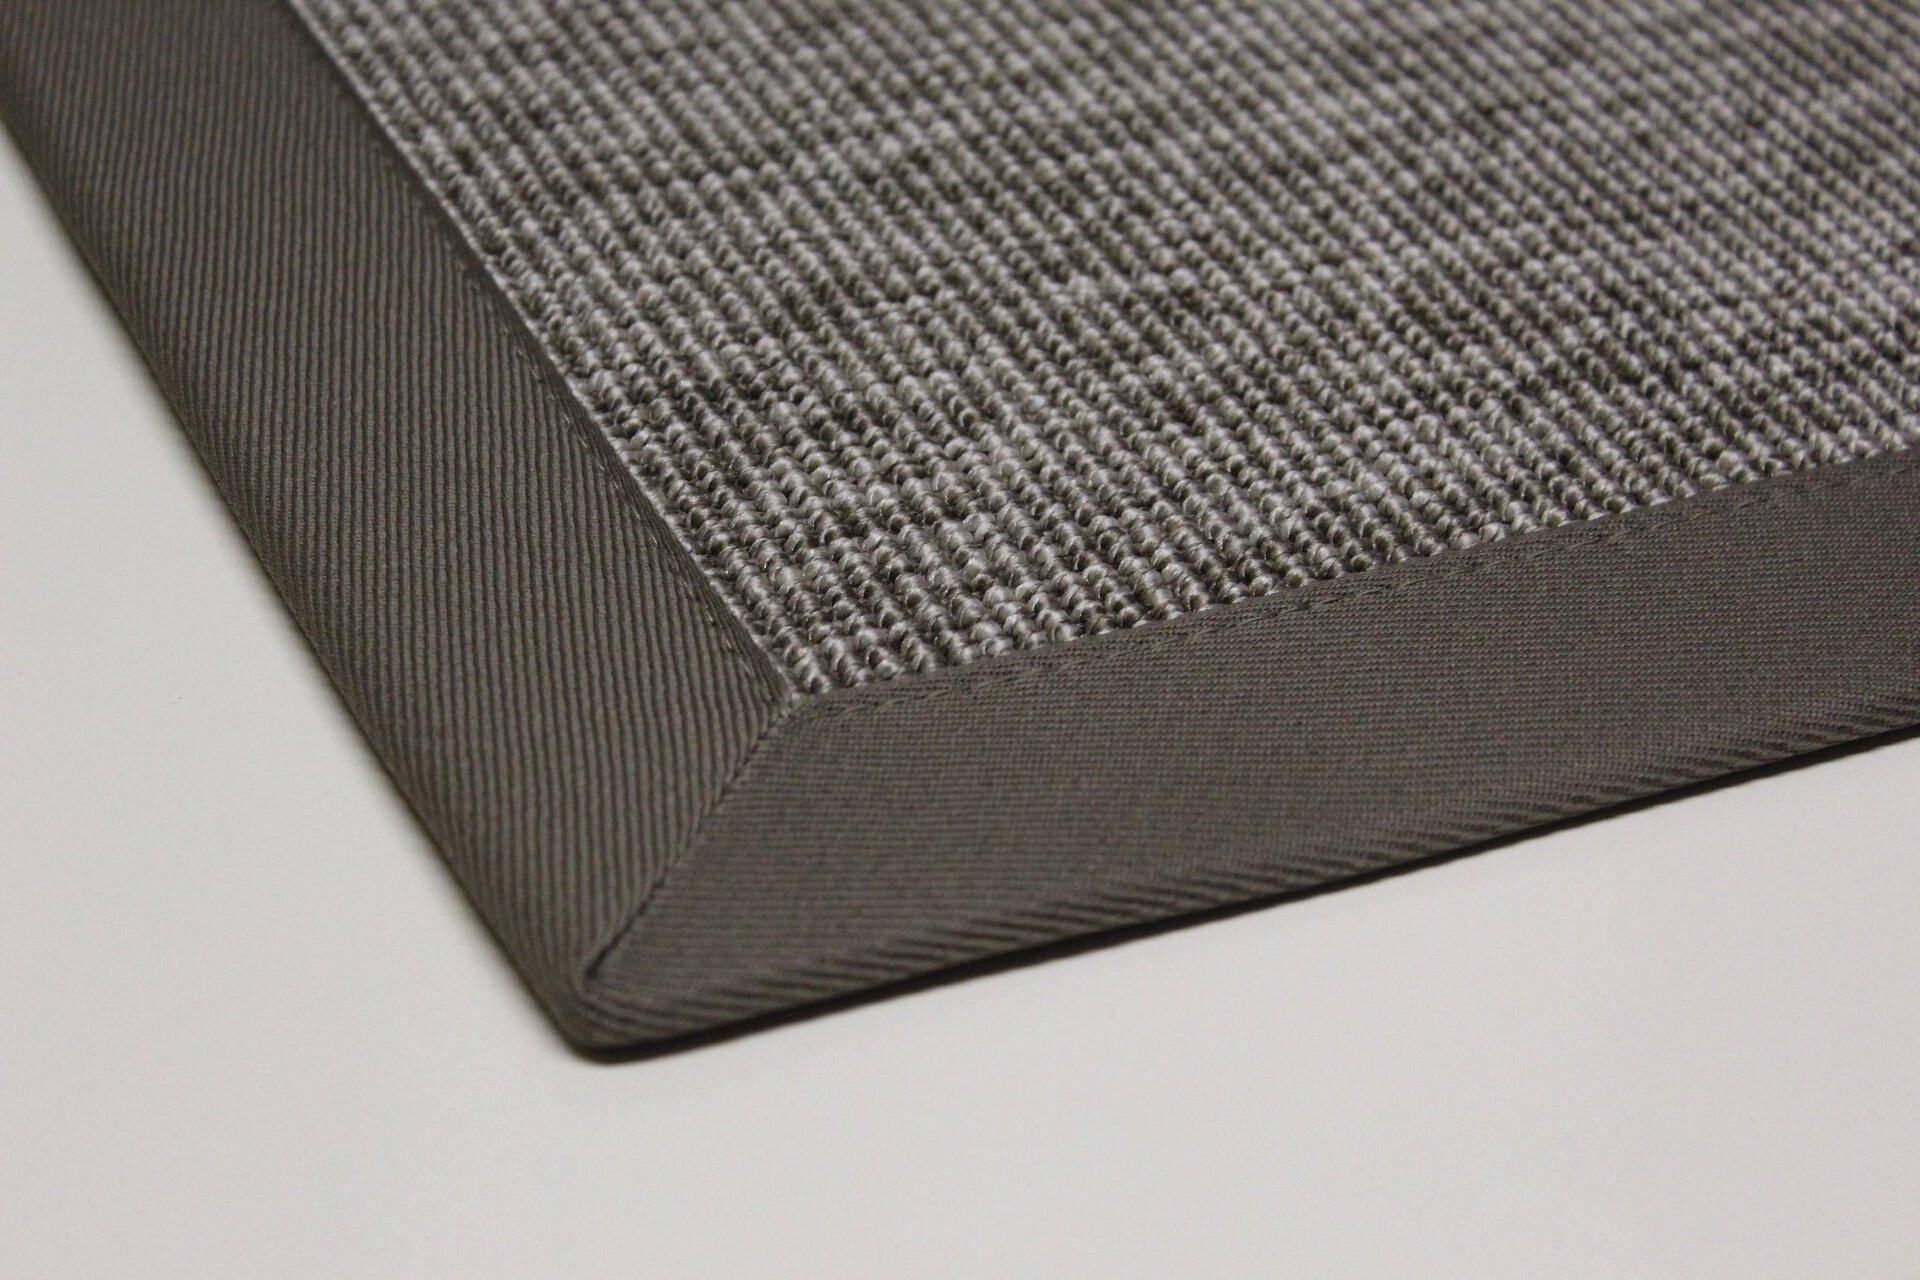 Outdoorteppich Naturino Rips DEKOWE Textil grau 67 x 133 cm